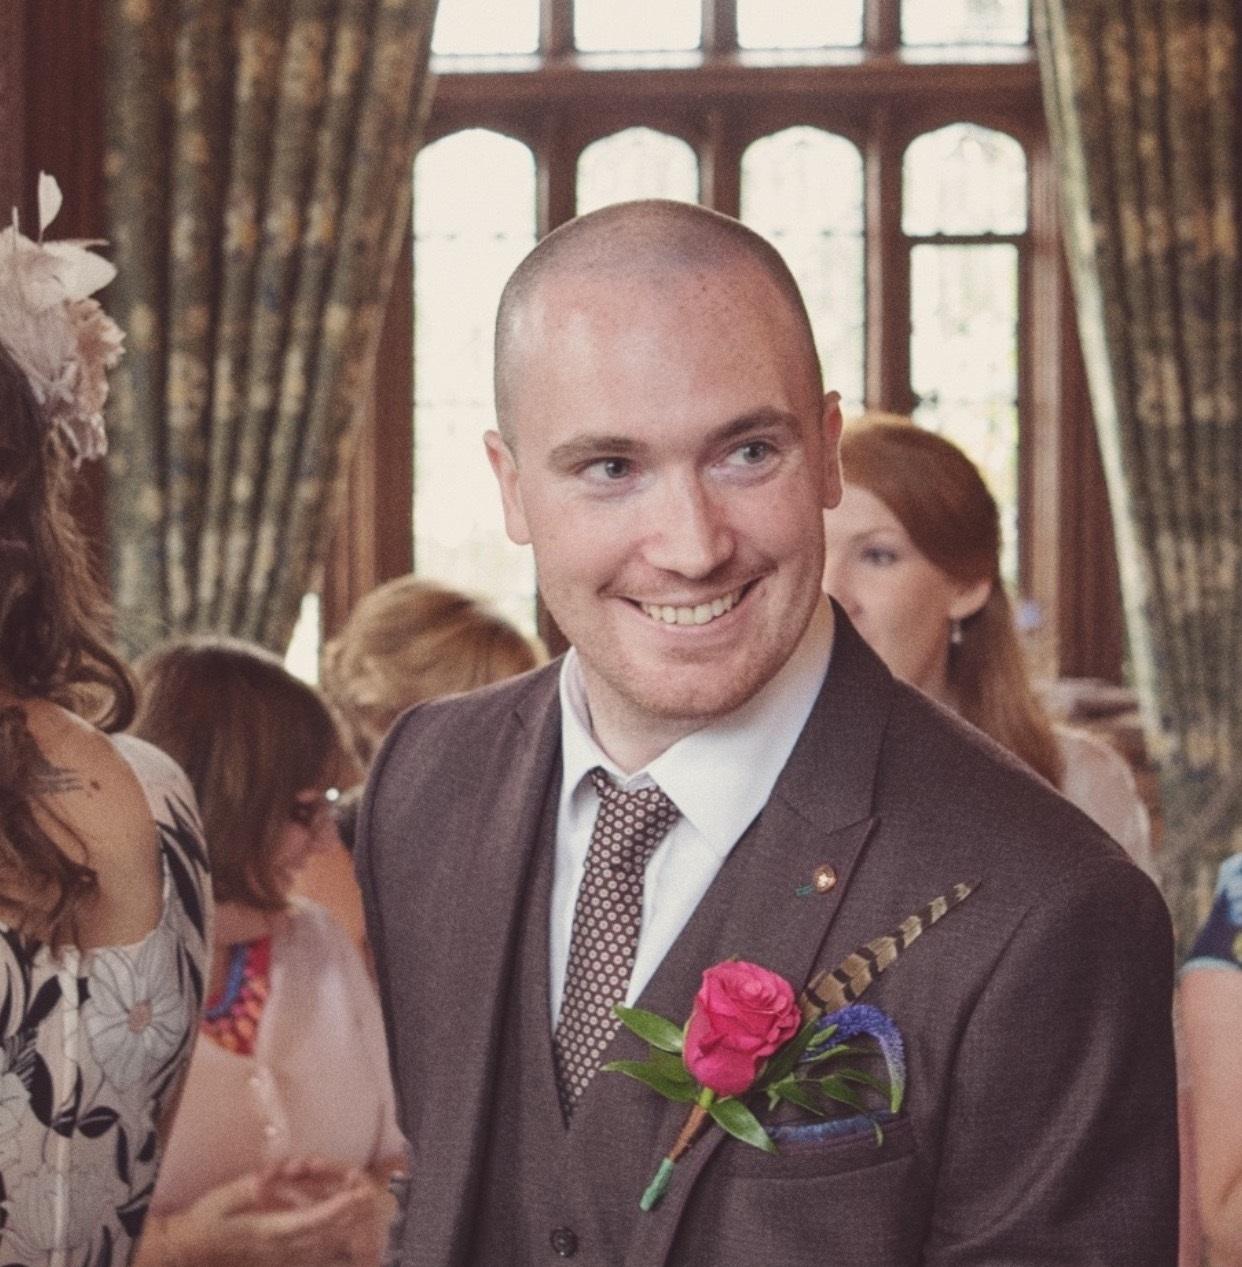 https://scriptumds.co.uk/wp-content/uploads/2018/03/ProfilePic-Wedding.jpg